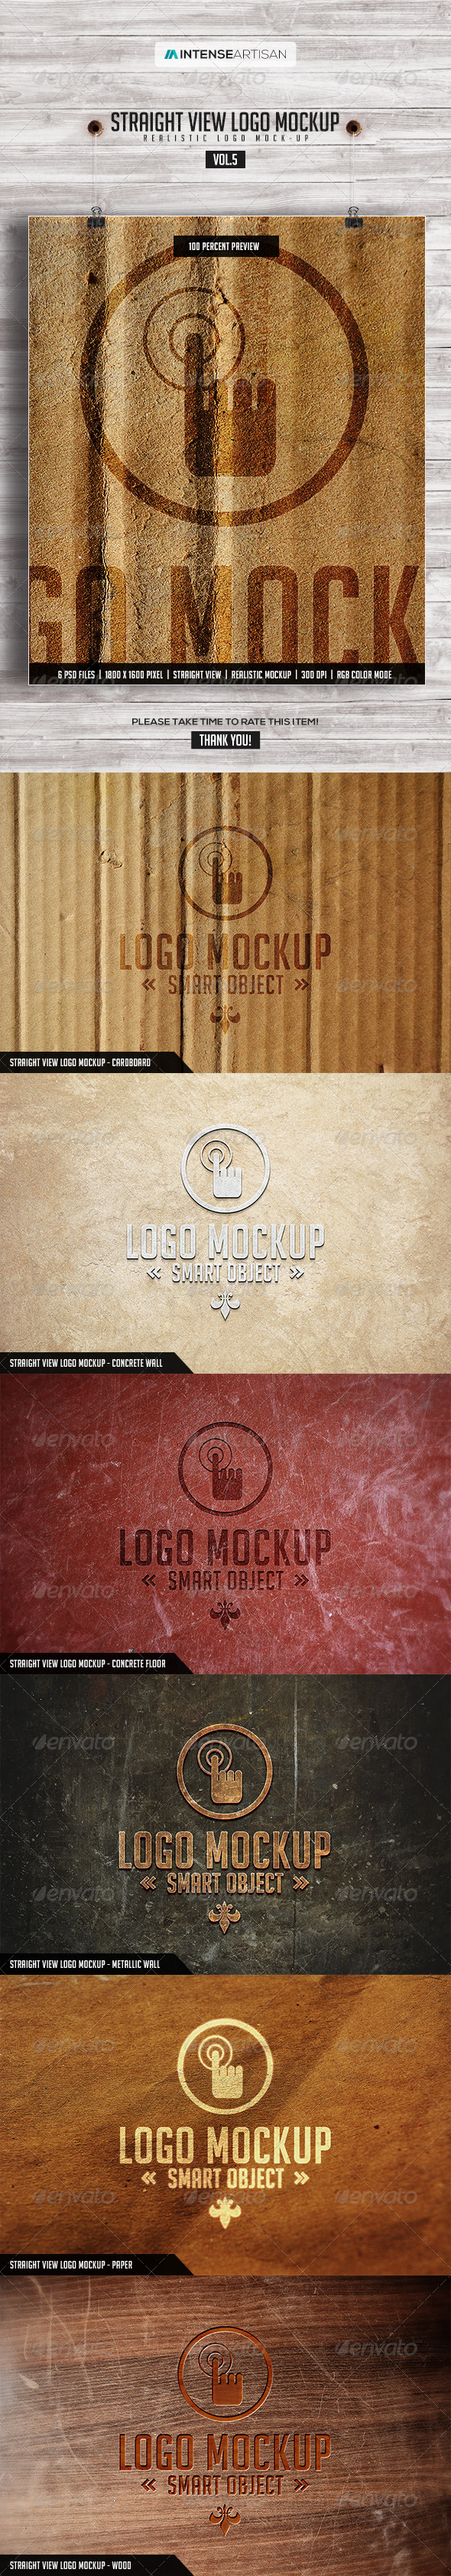 Straight View Logo Mockup - Vol.5 - Logo Product Mock-Ups